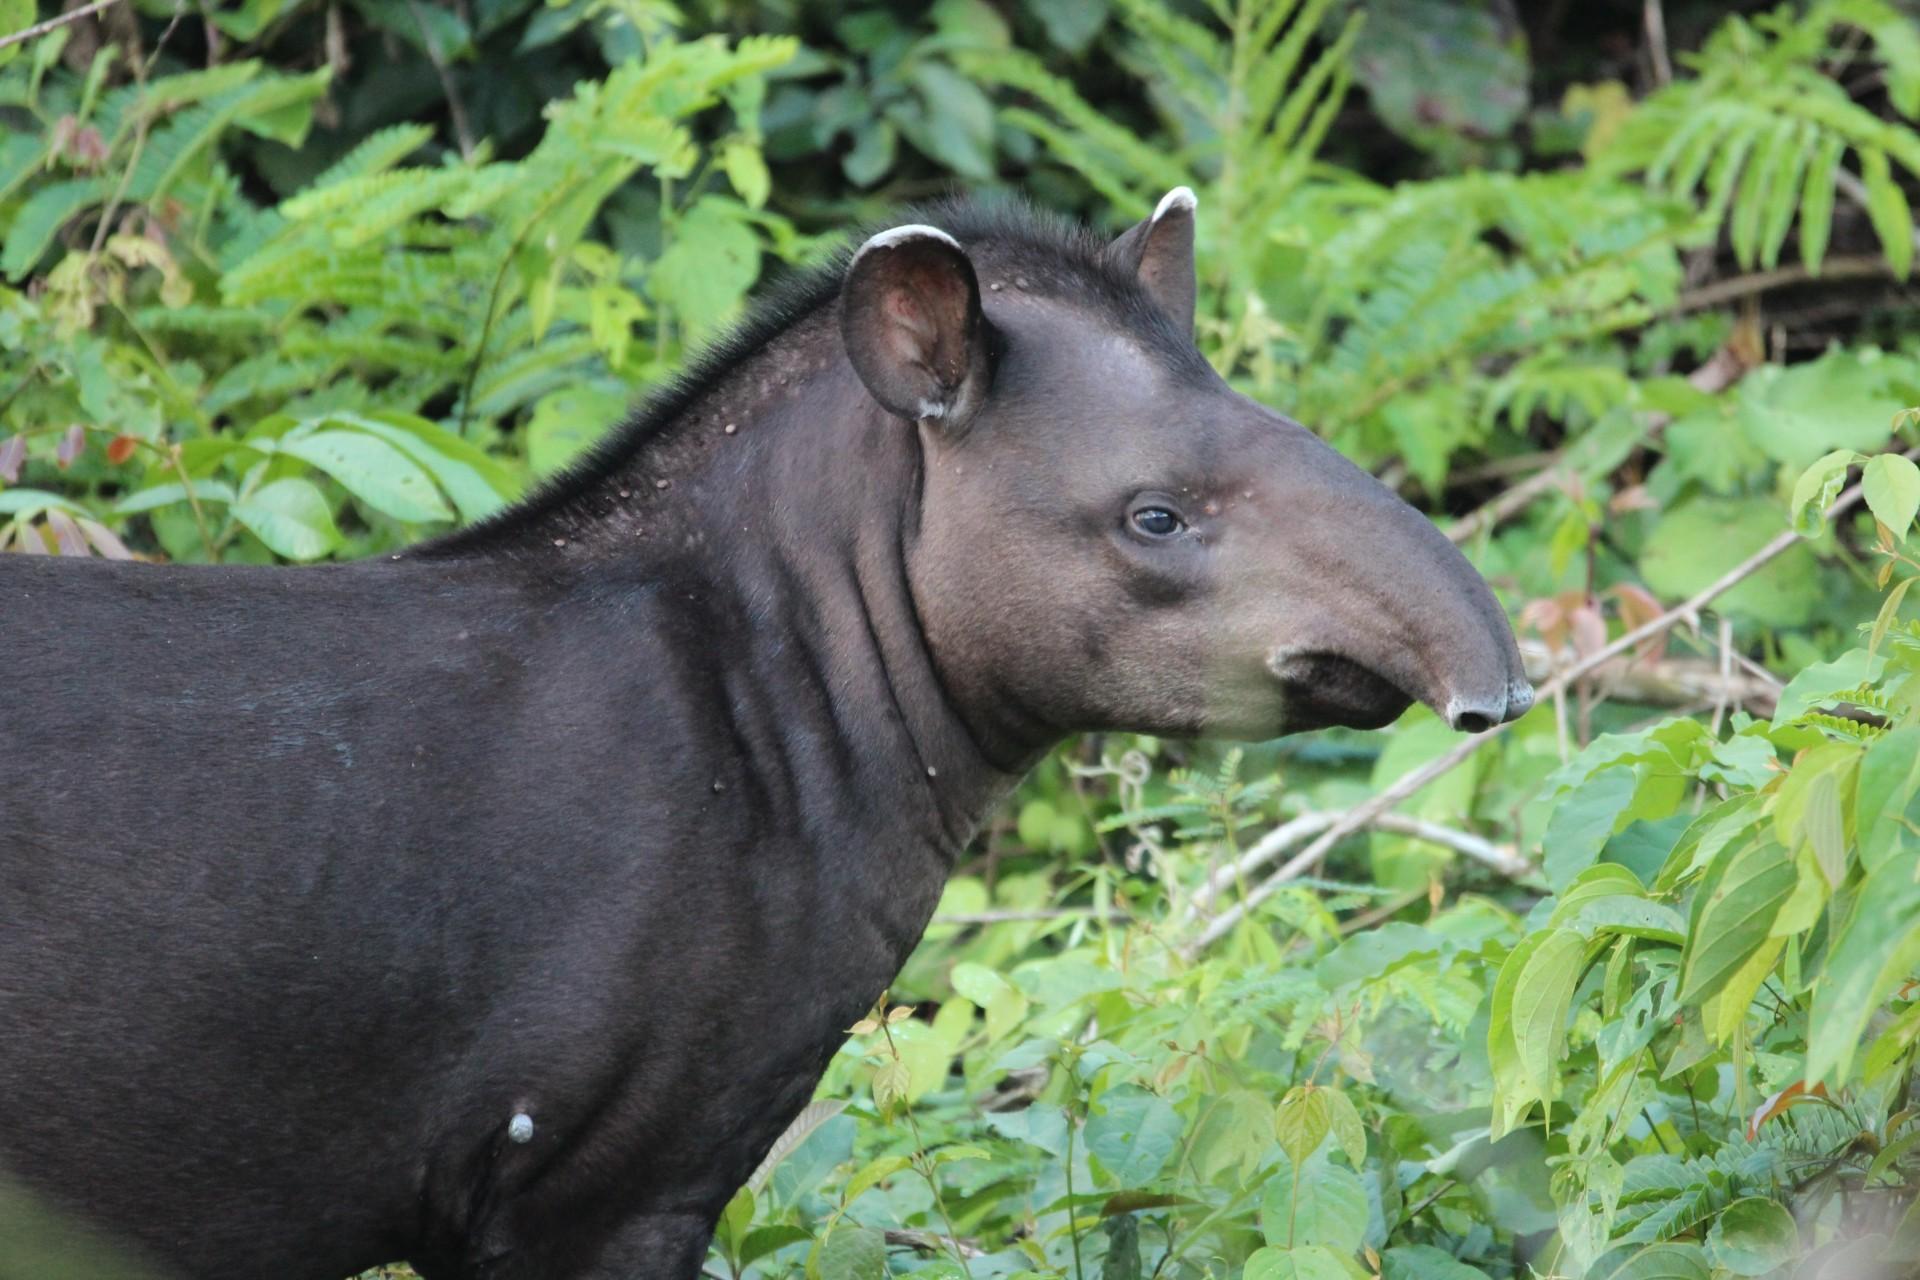 Anta (Tapirus terrestris) fotografada durante saída de campo na Fazenda São Nicolau (Foto: Gustavo Canale)